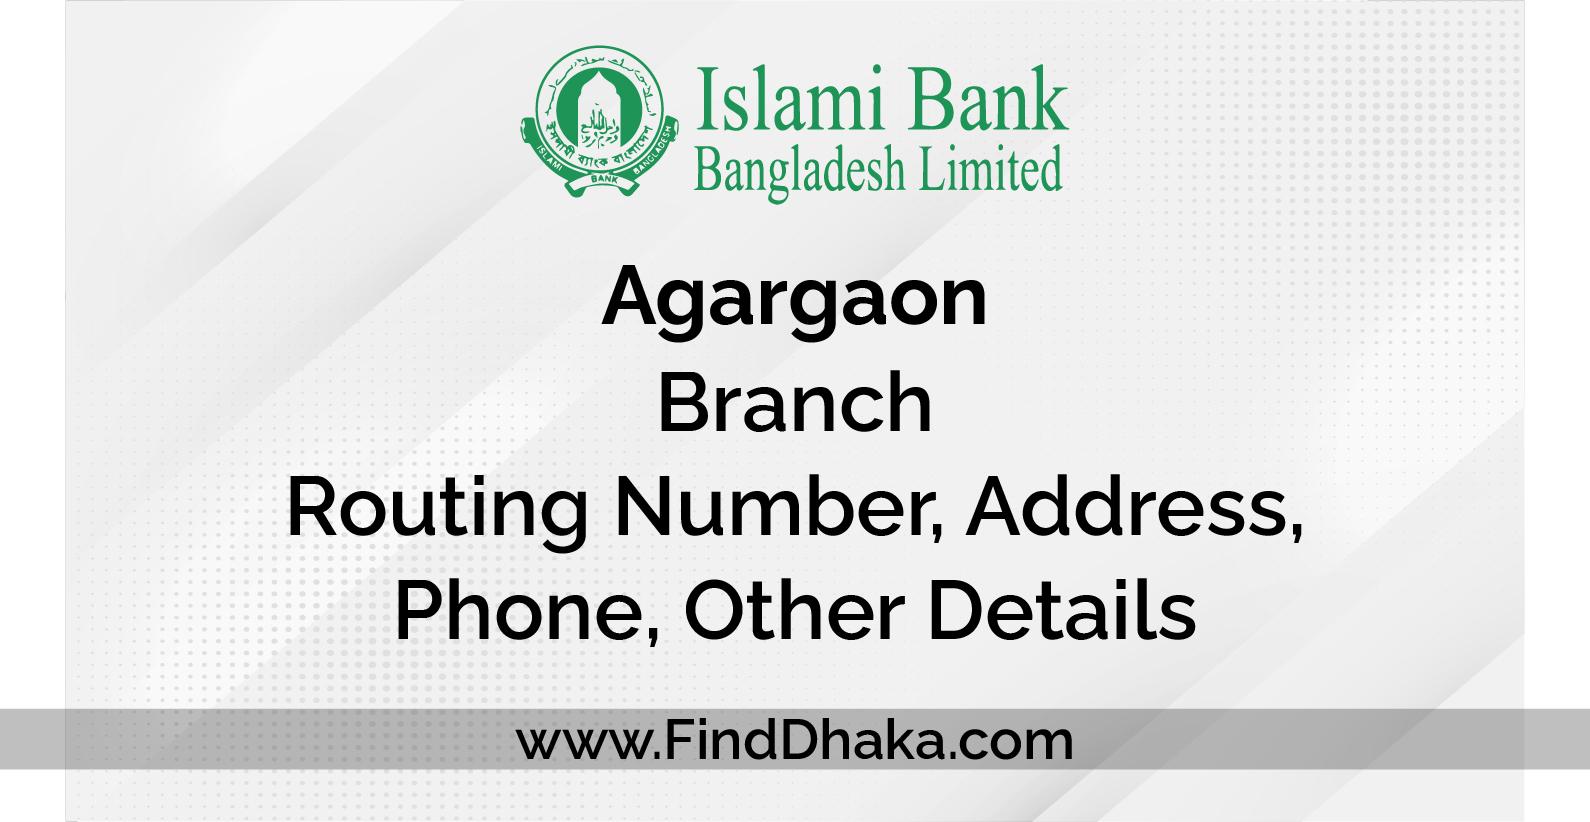 Islami Bank info005000 2